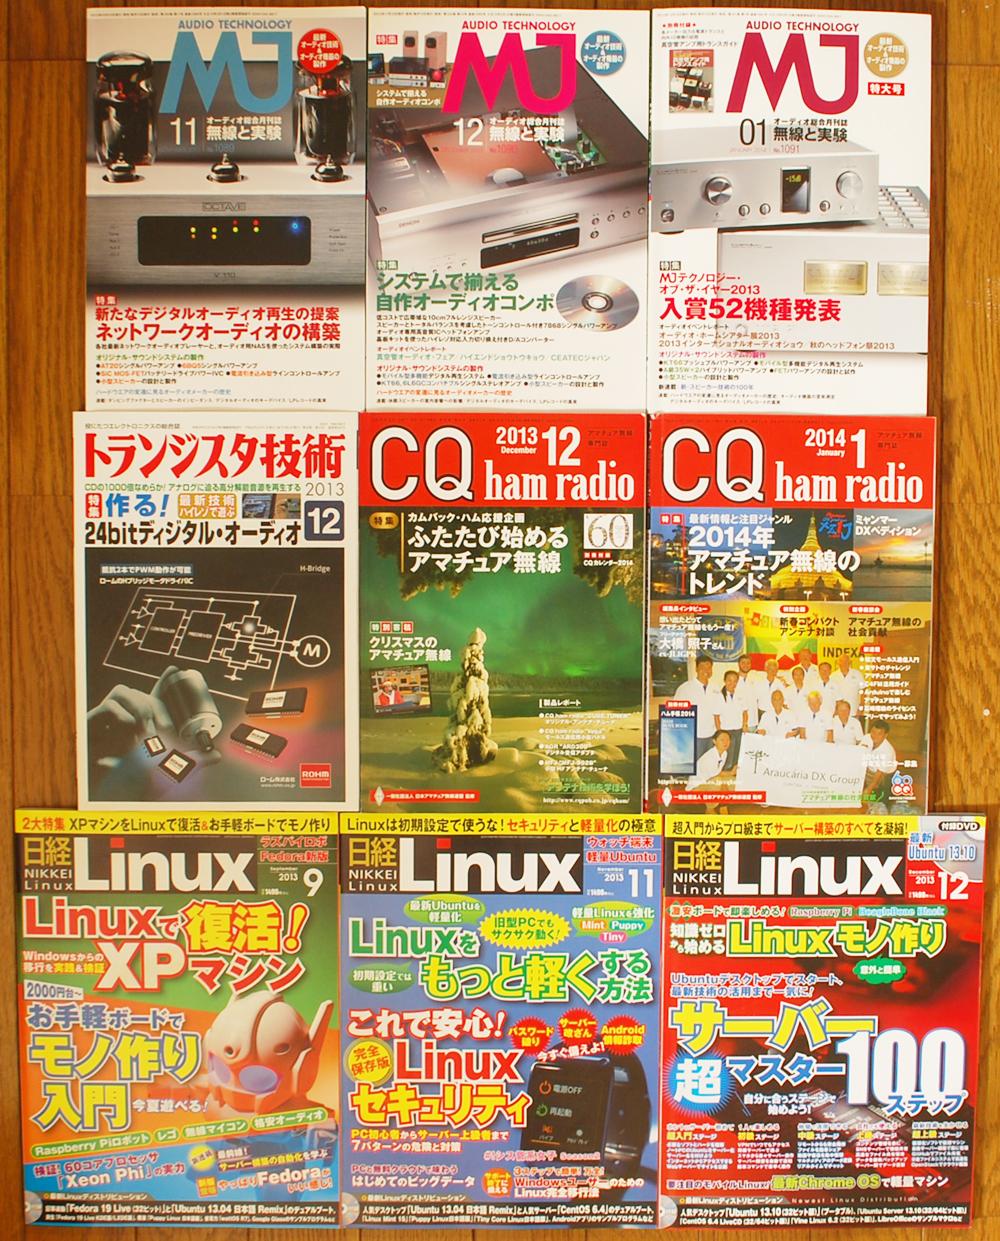 MJ無線と実験、CQ ham radio (ハムラジオ)、日経 Linux (リナックス)バックナンバーを買取